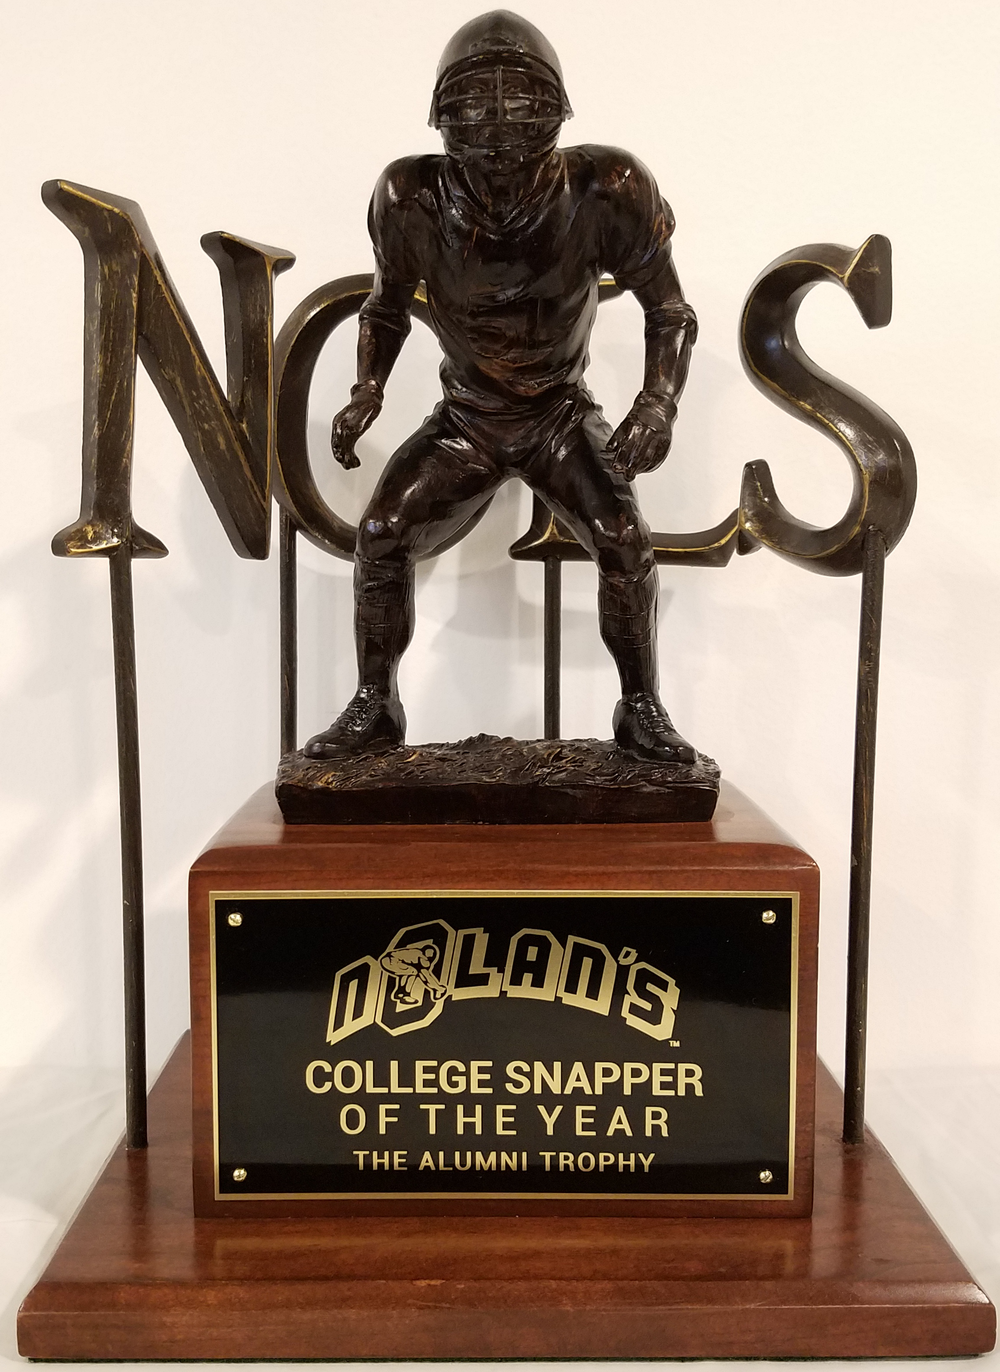 Nolan's-The-Alumni-Trophy.png